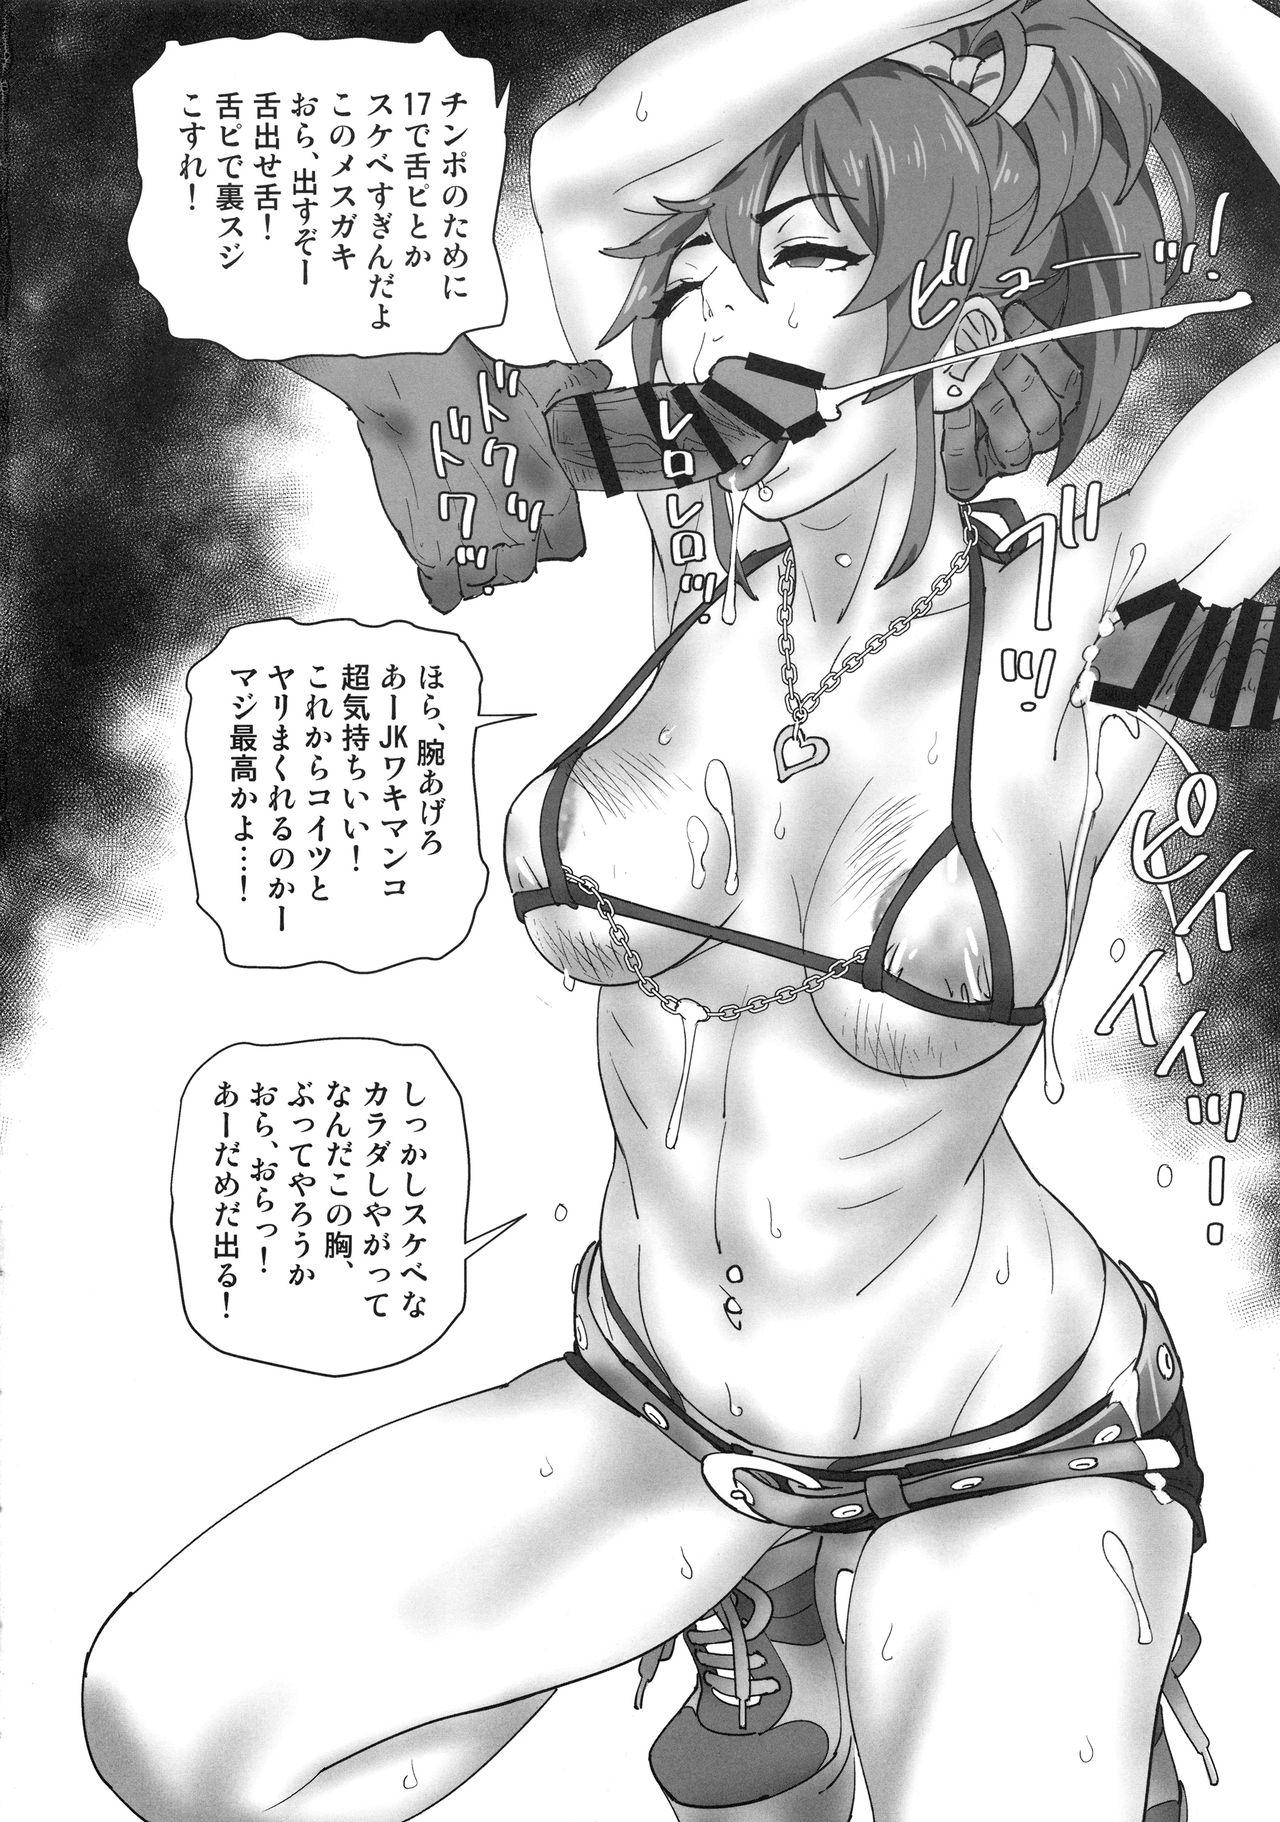 Mika Kenkyuussho 16